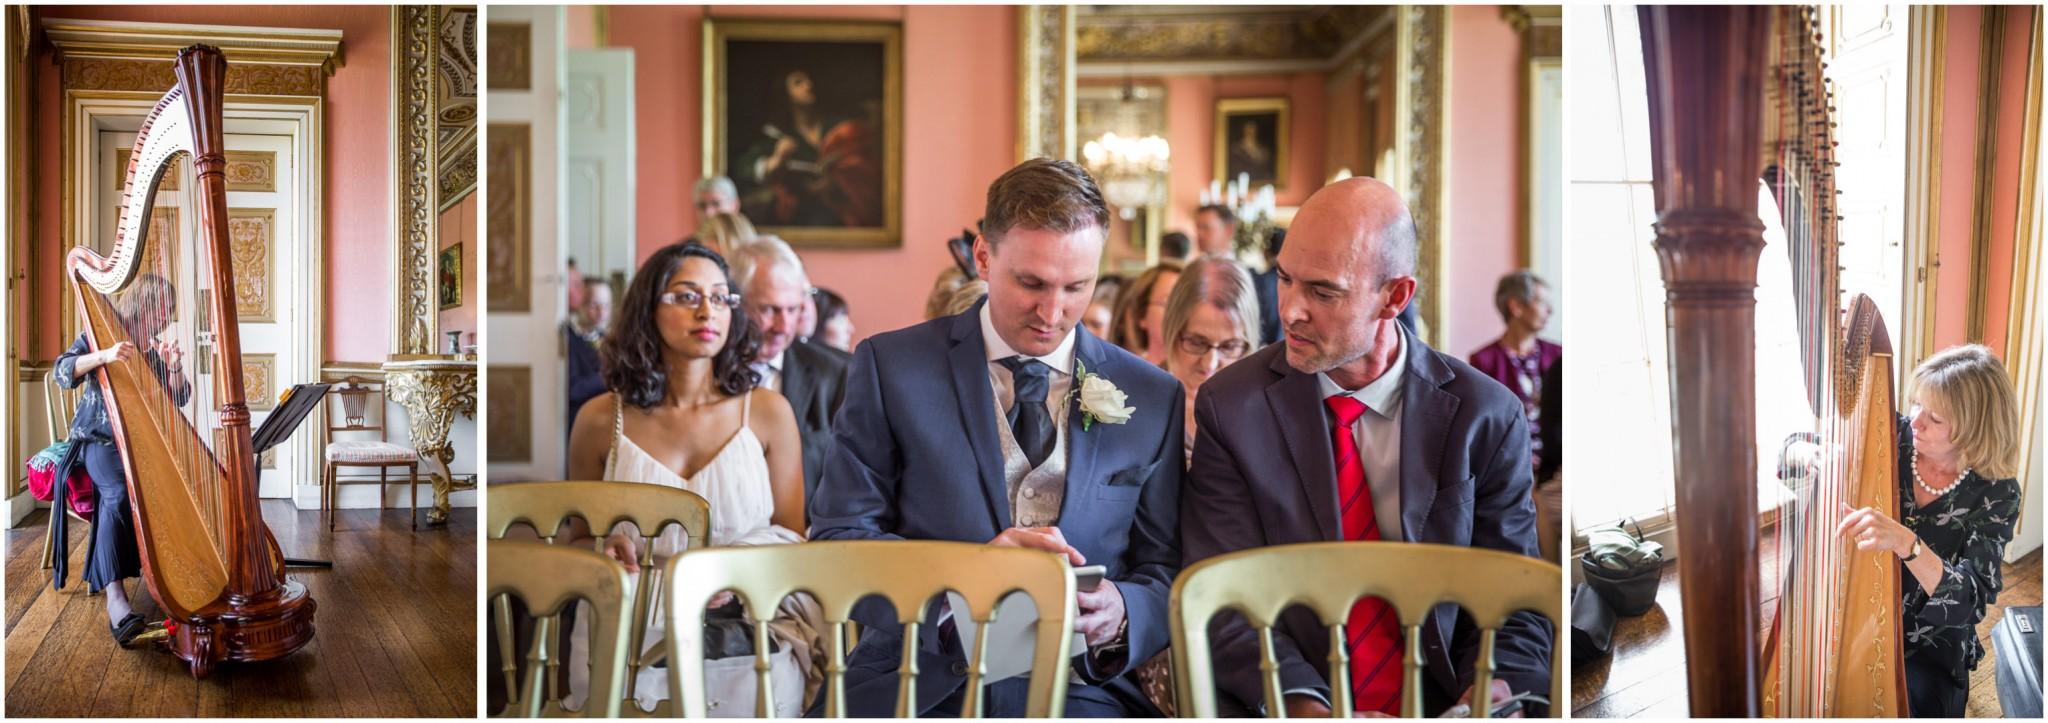 Avington Park Wedding Guests arriving